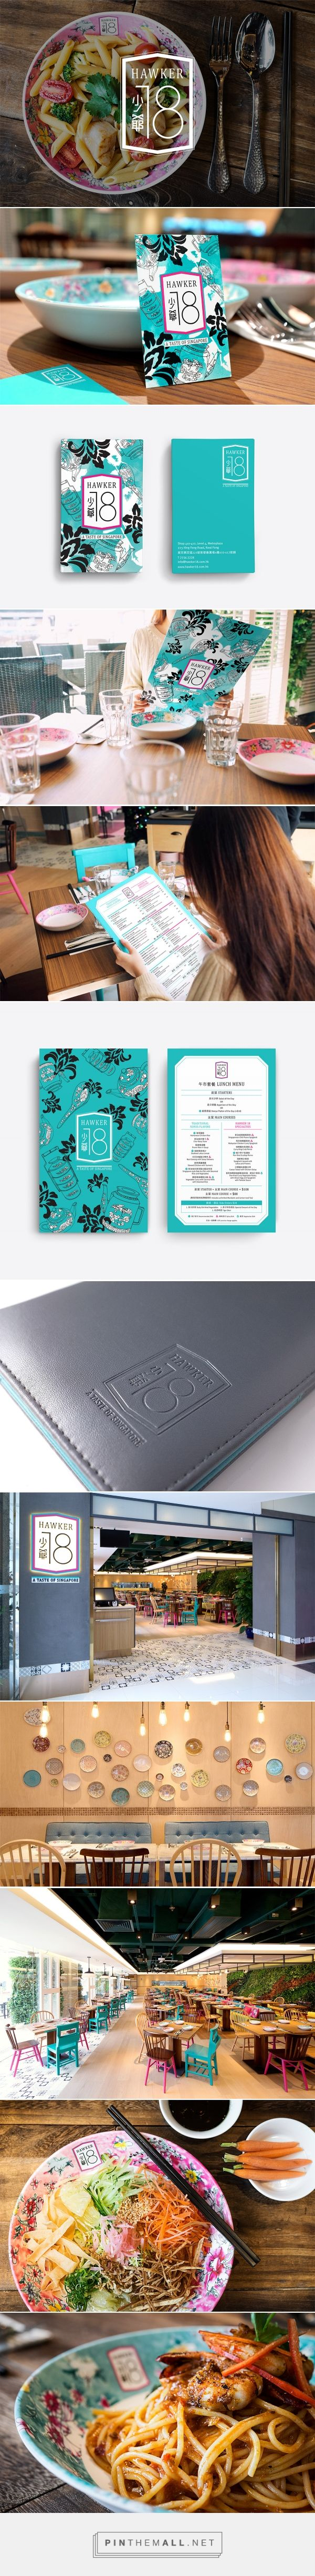 Hawker 18 Restaurant Branding and Menu Design by Trevor Wong | Fivestar Branding Agency – Design and Branding Agency & Curated Inspiration Gallery